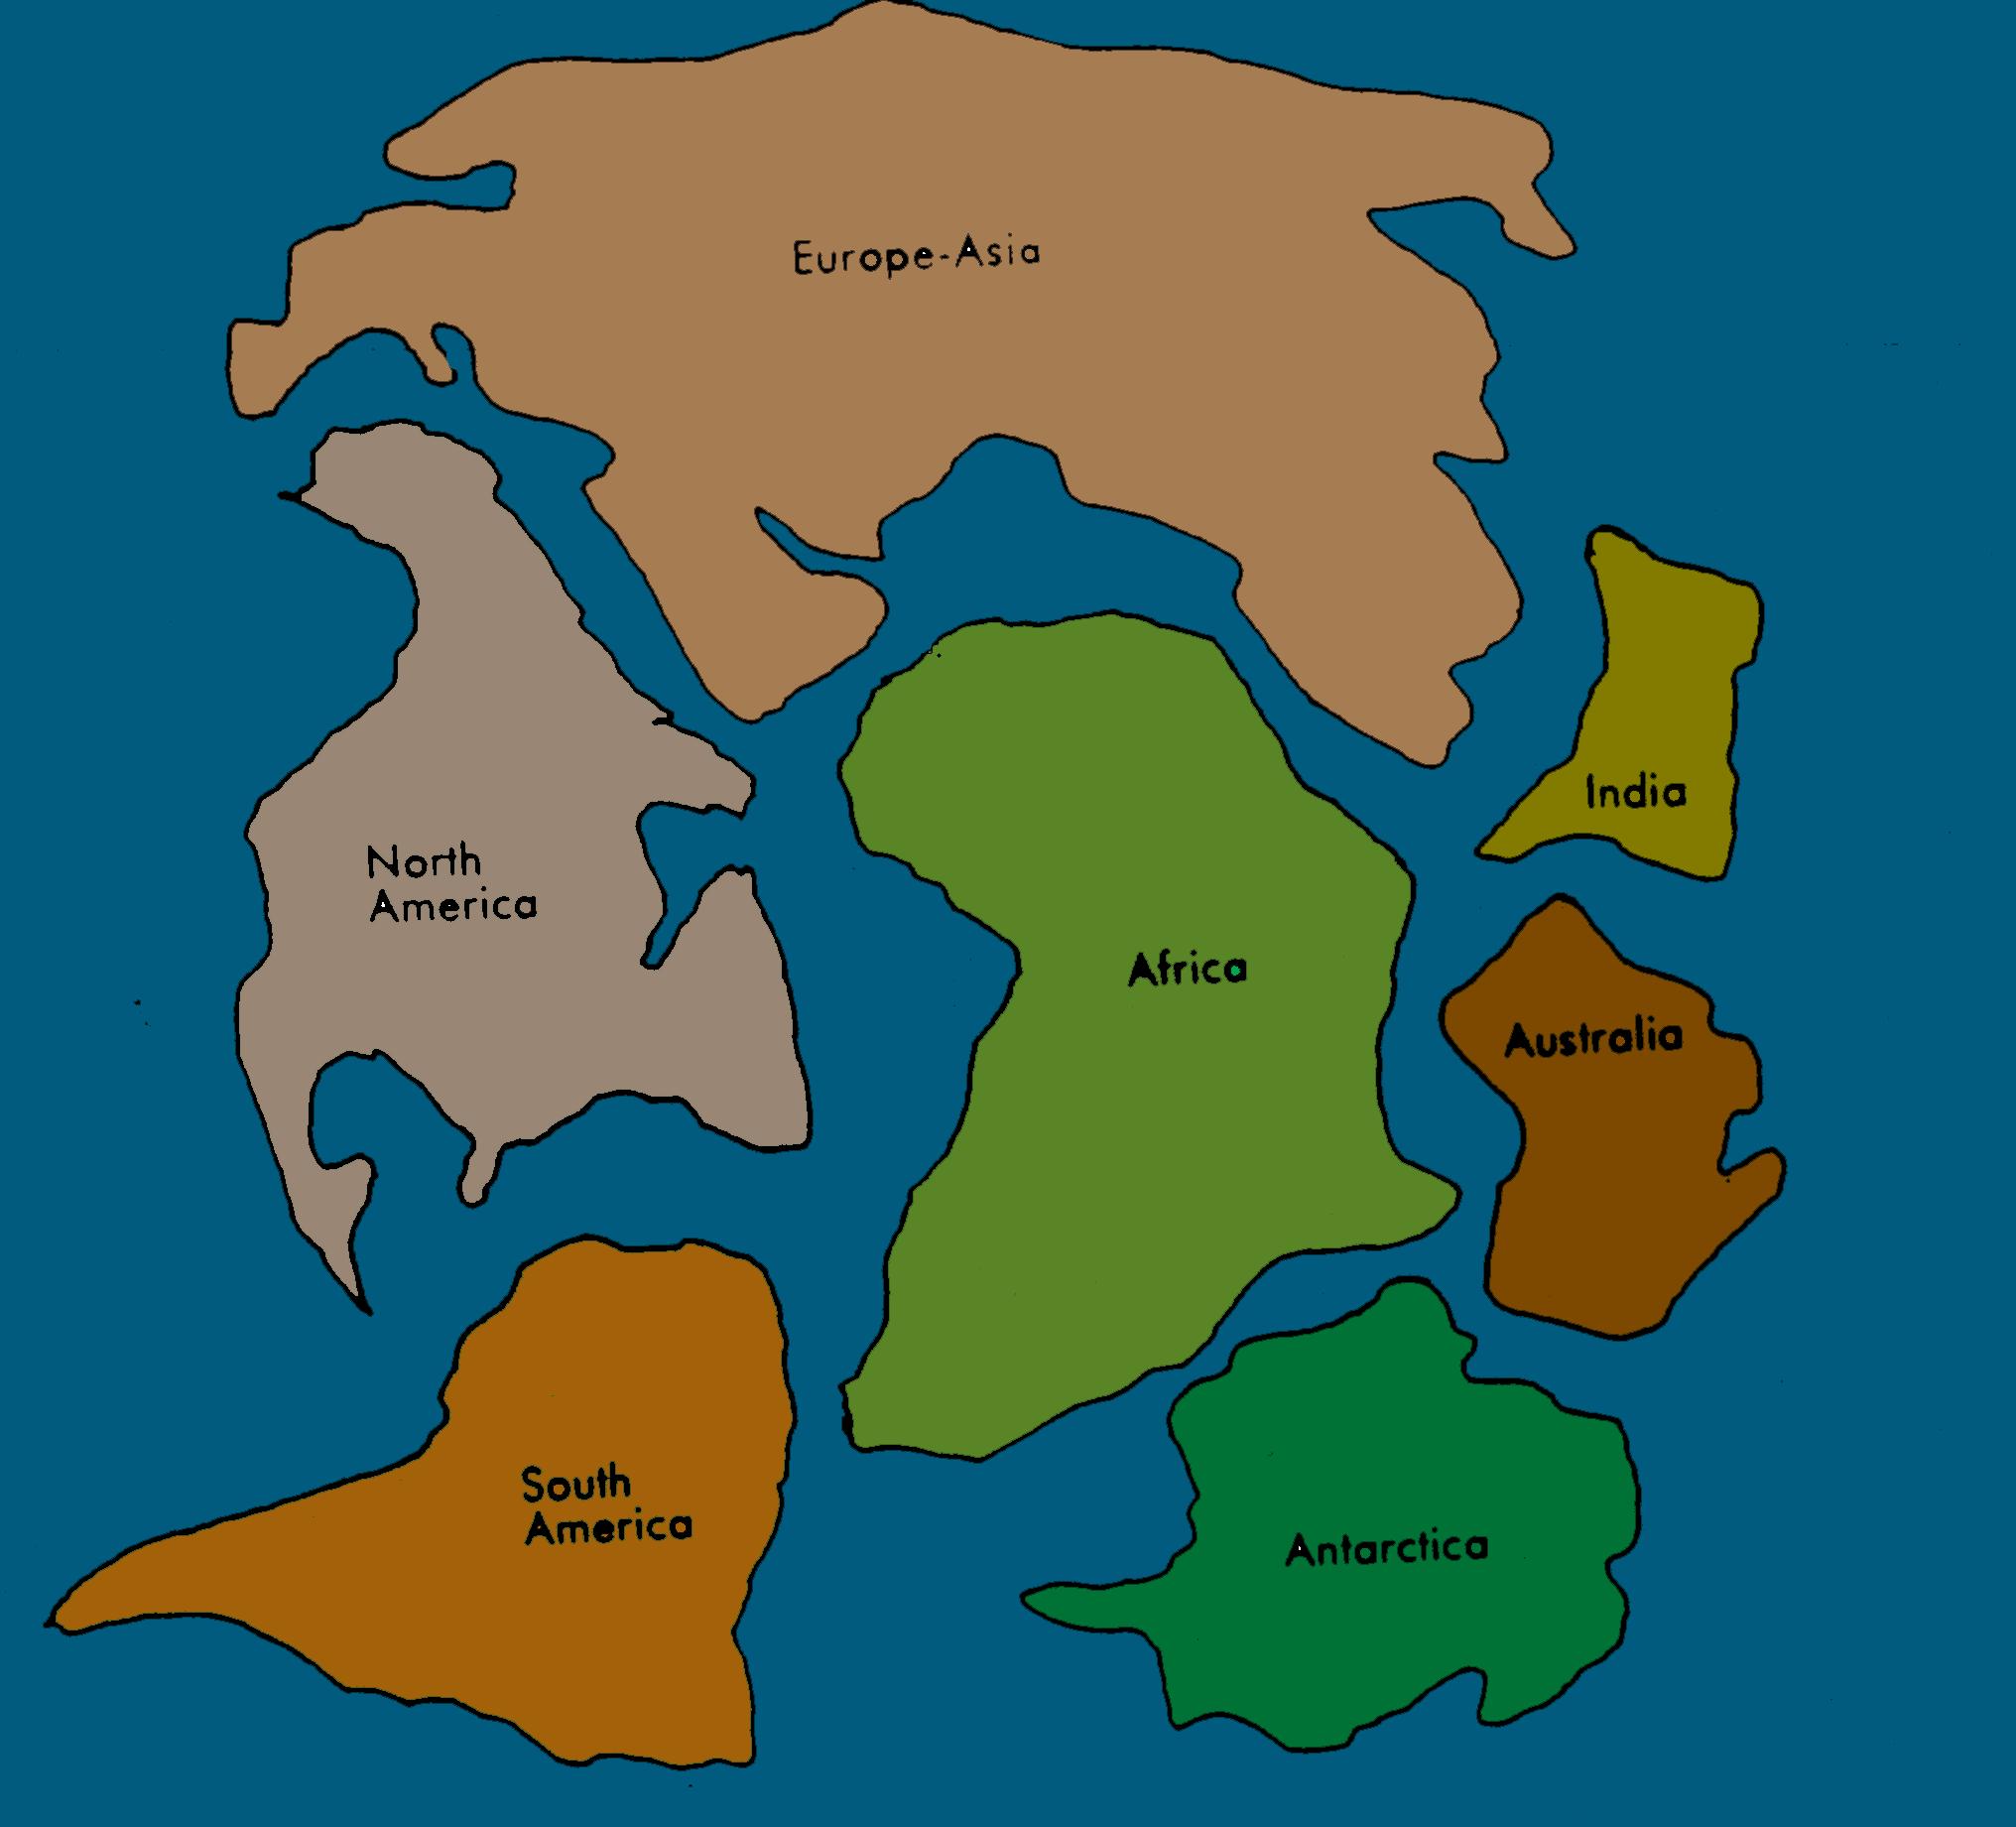 Pangaea Continents 6 Bible Study Illustrations